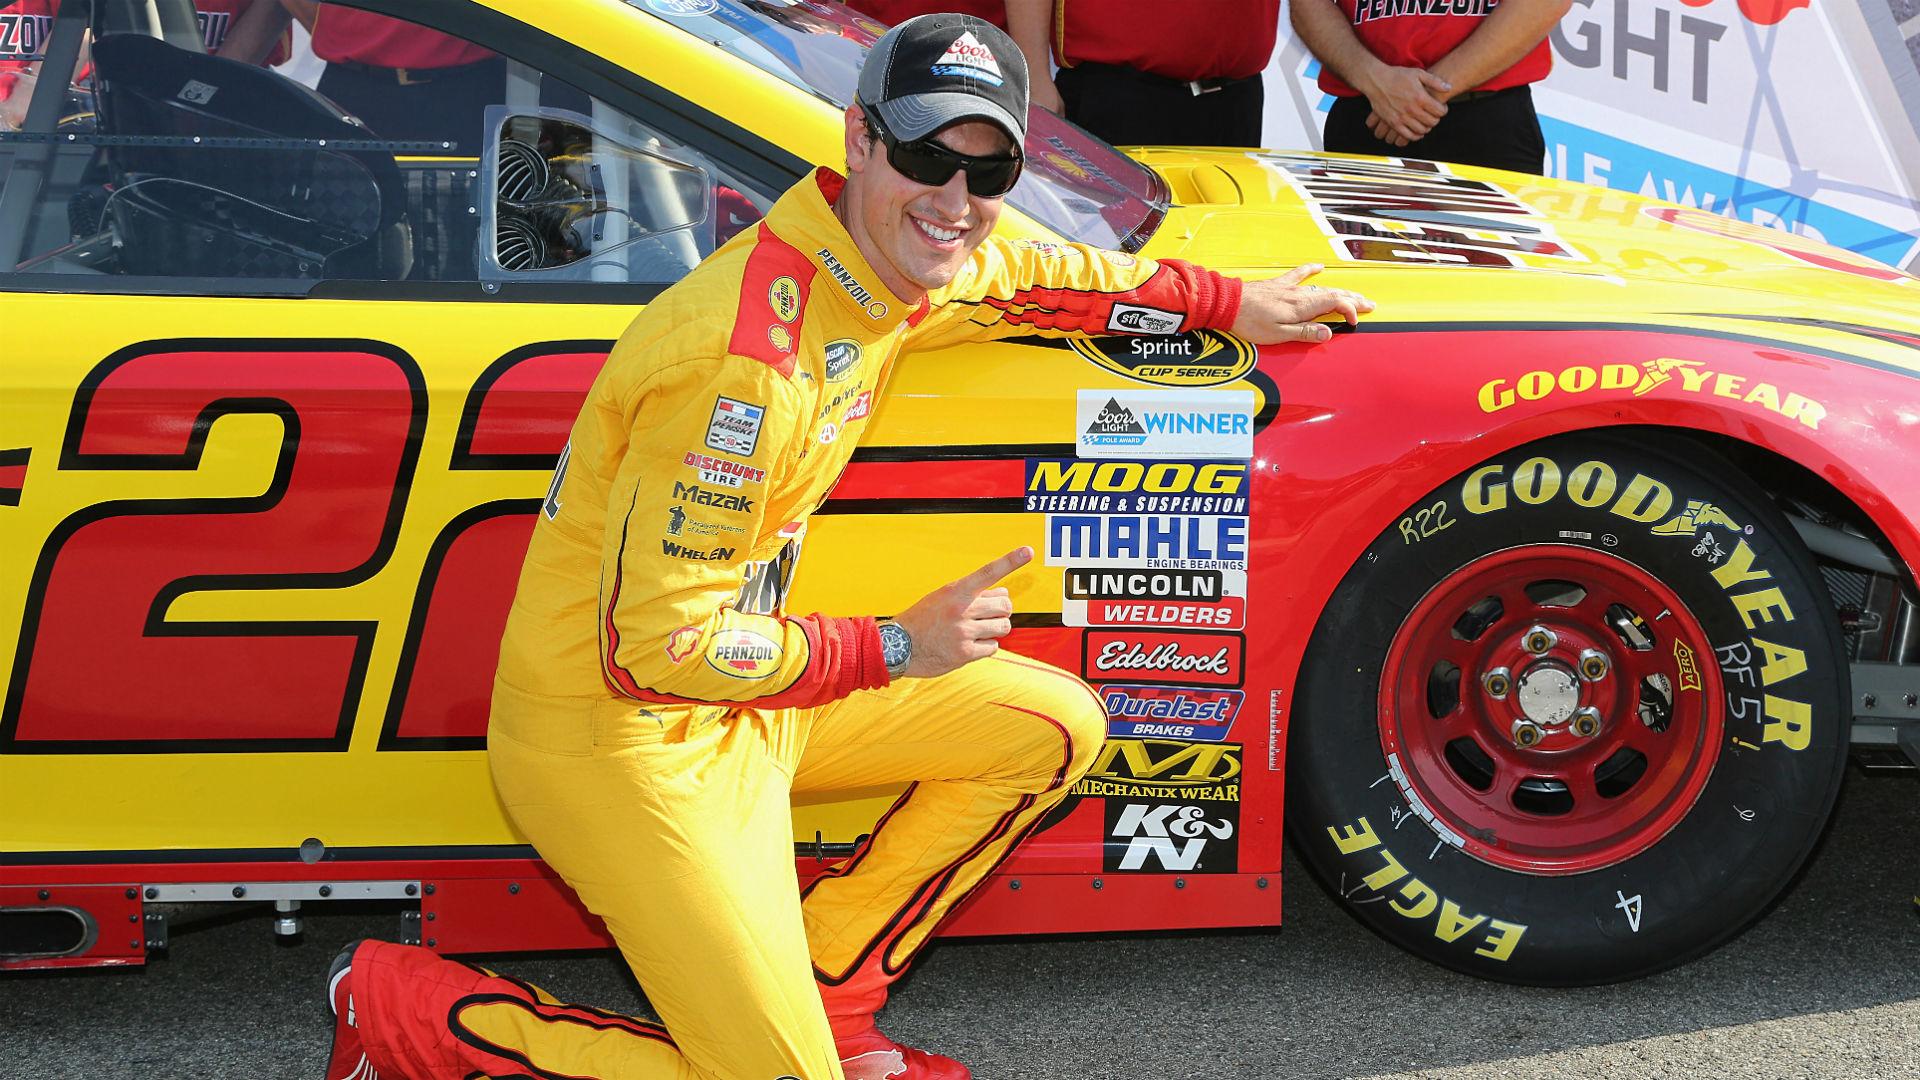 NASCAR starting lineup at Daytona: Joey Logano on pole as lightning cancels qualifying